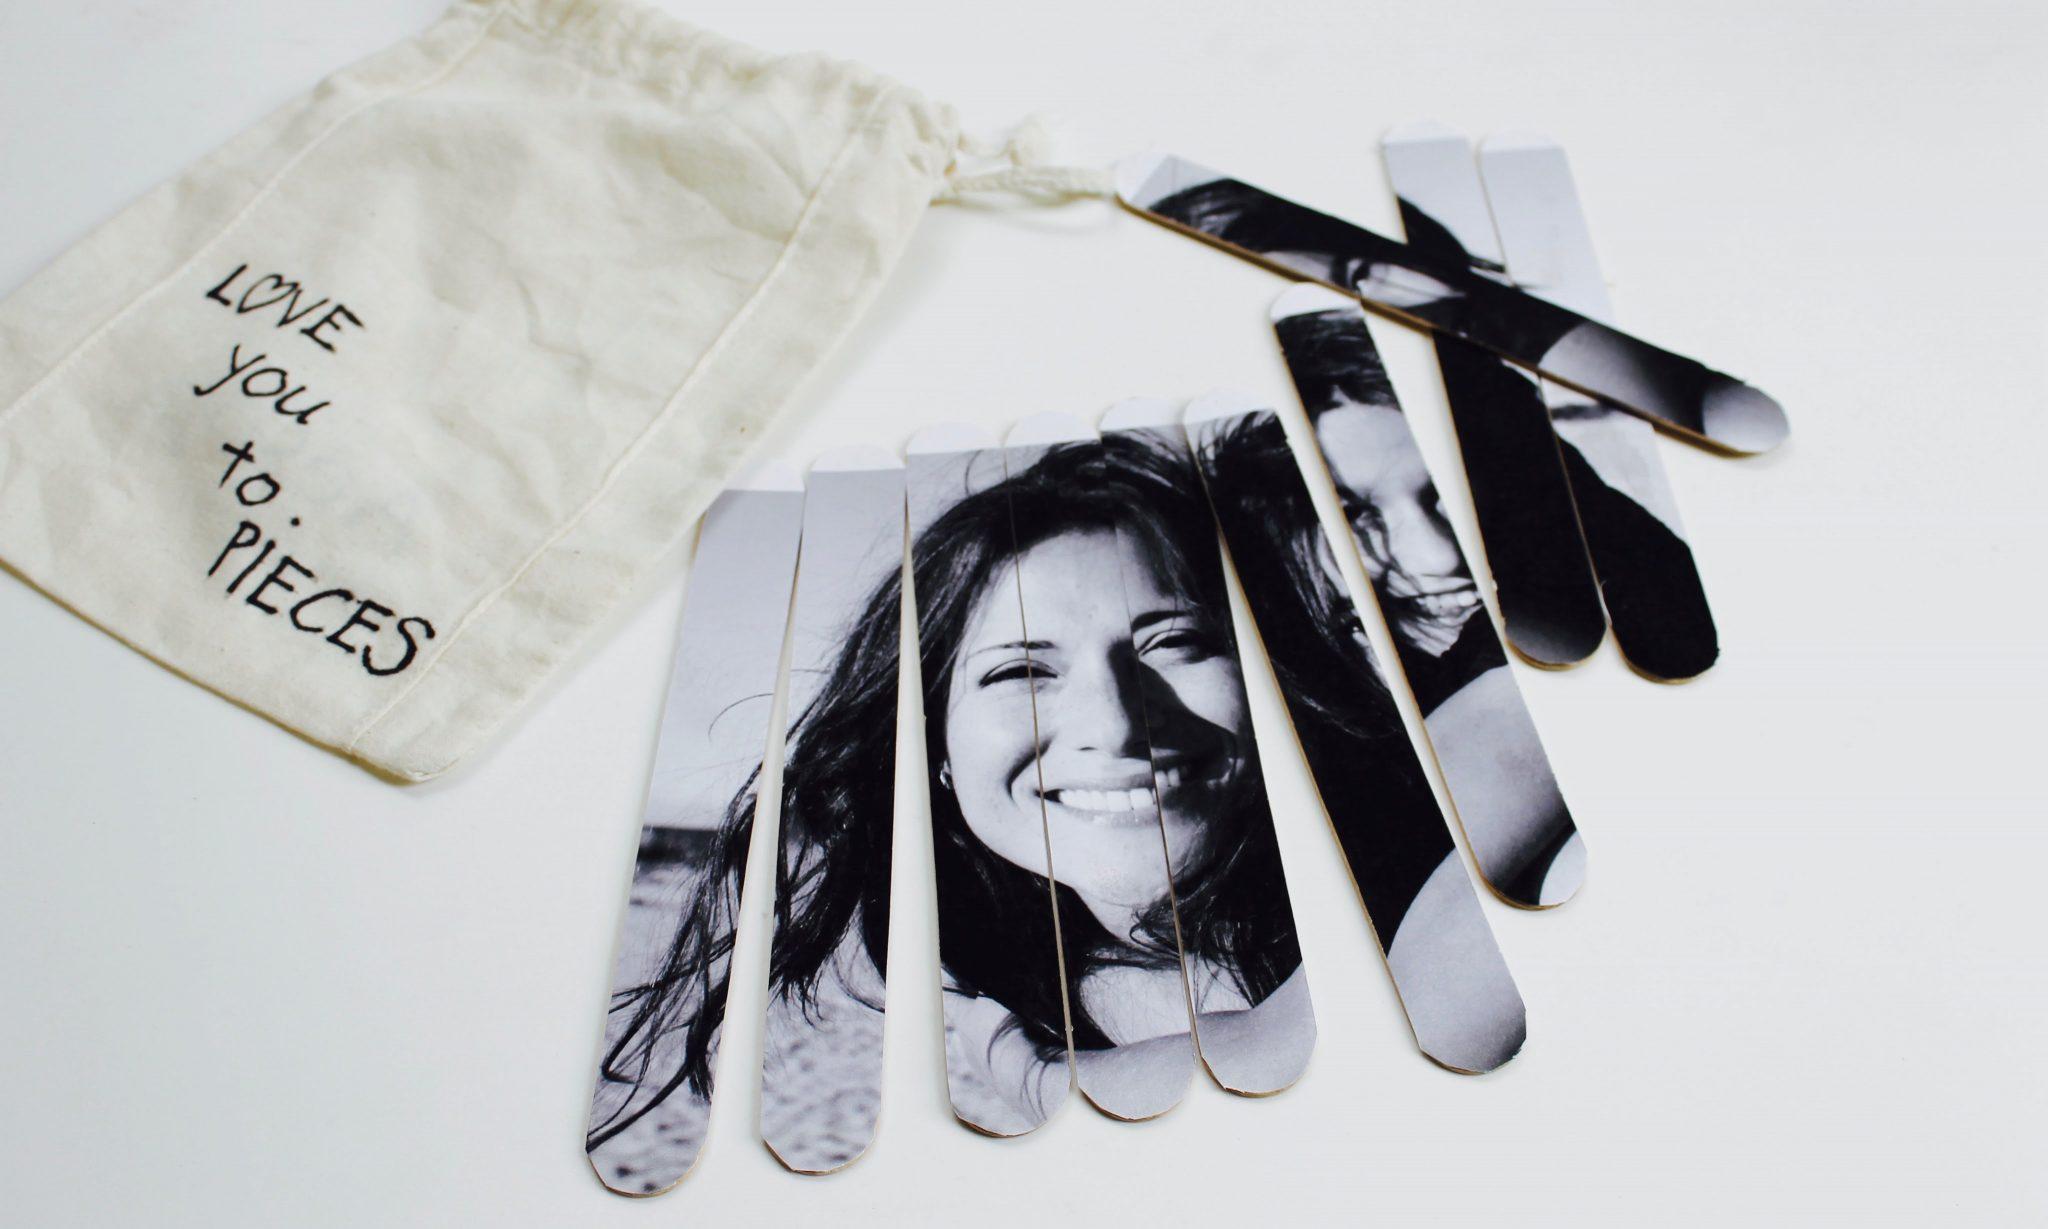 Crafts to make with ice cream sticks 03